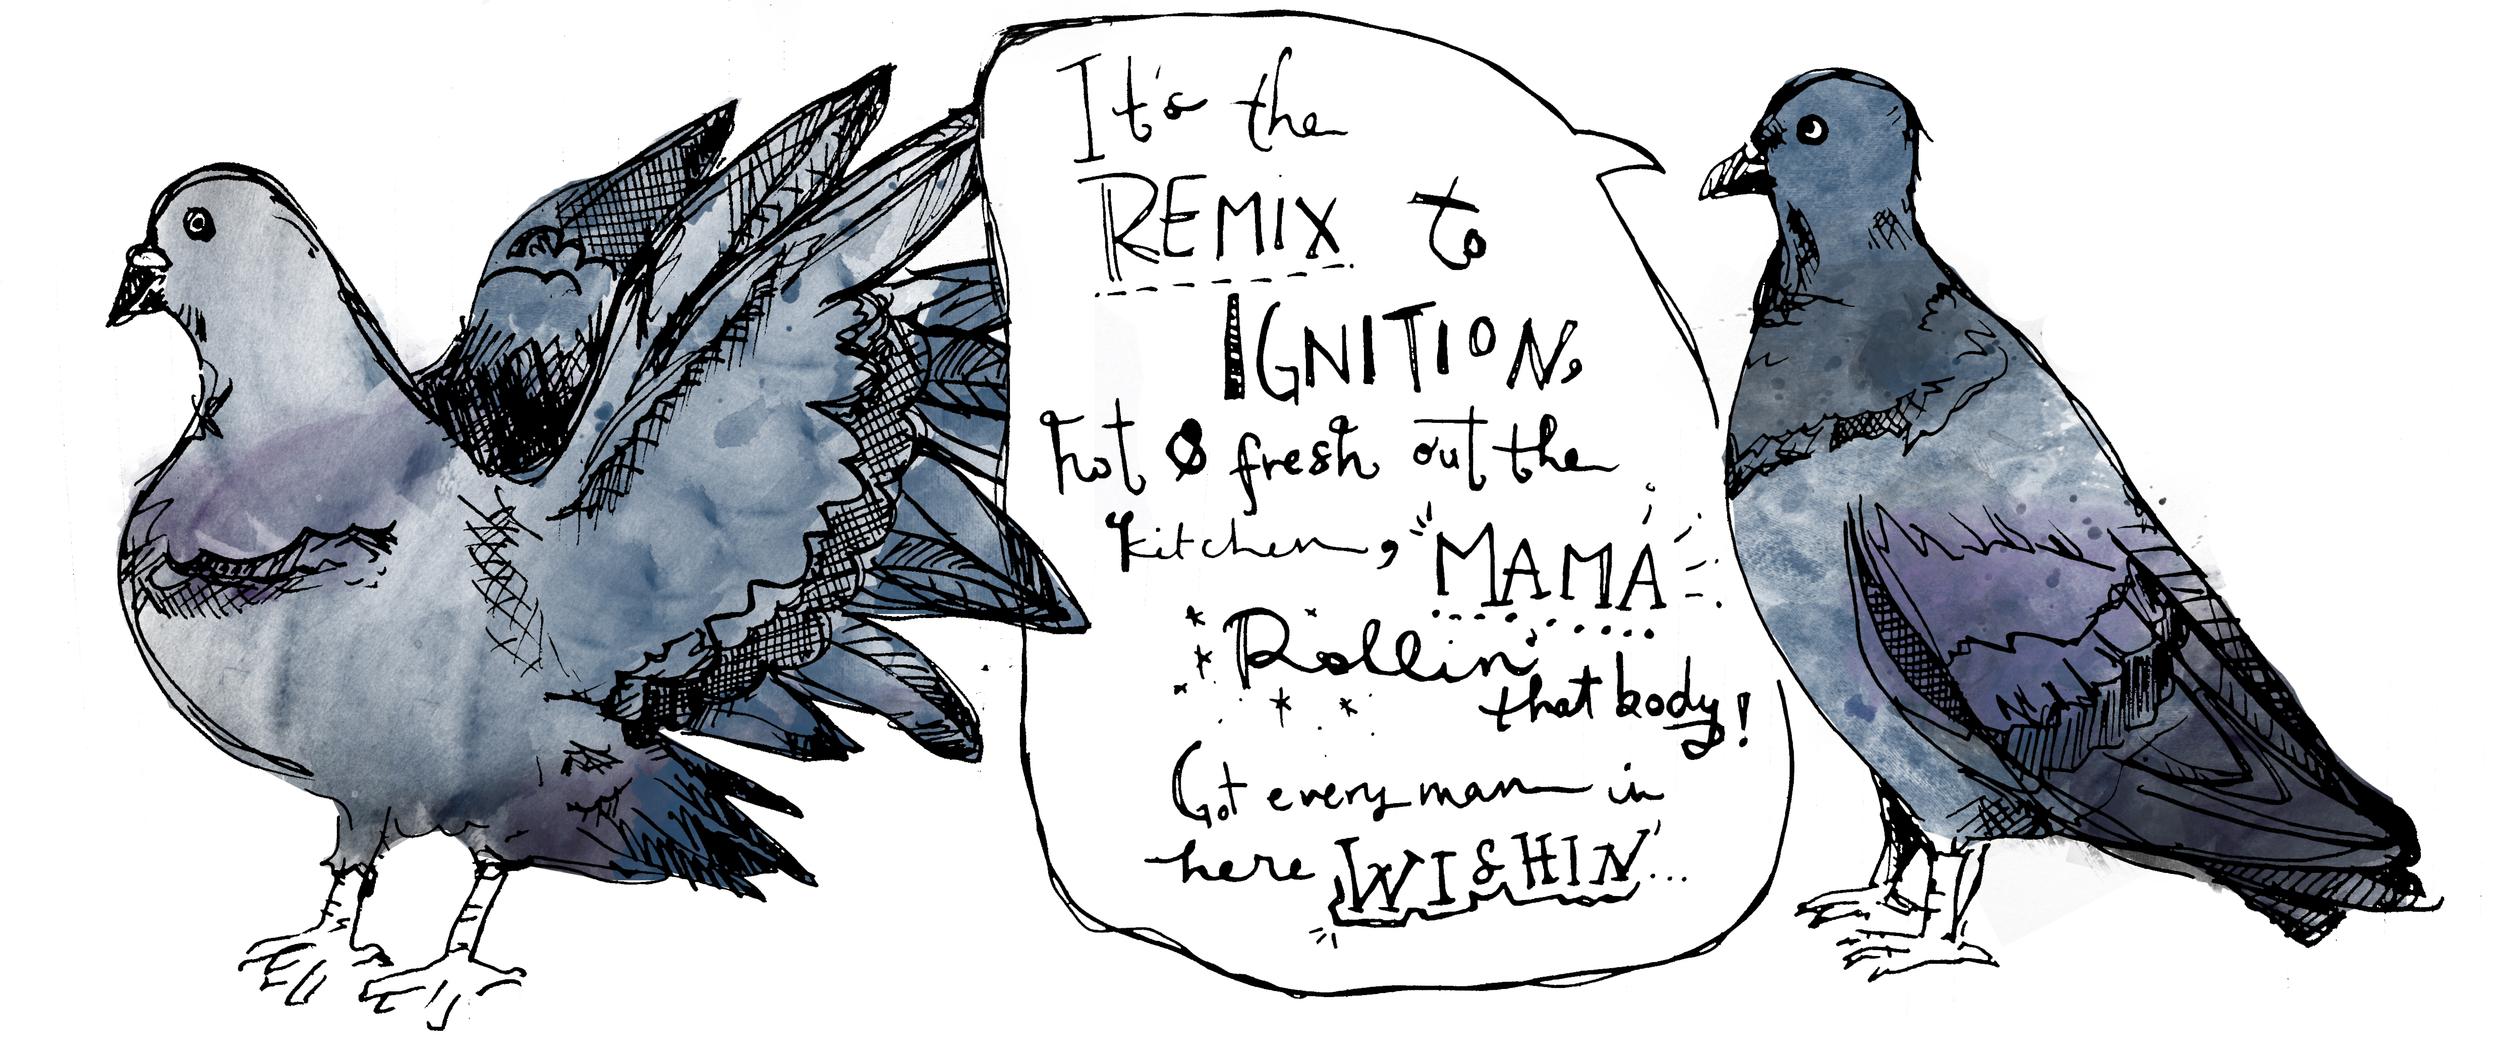 Ignition (Remix), (2014)